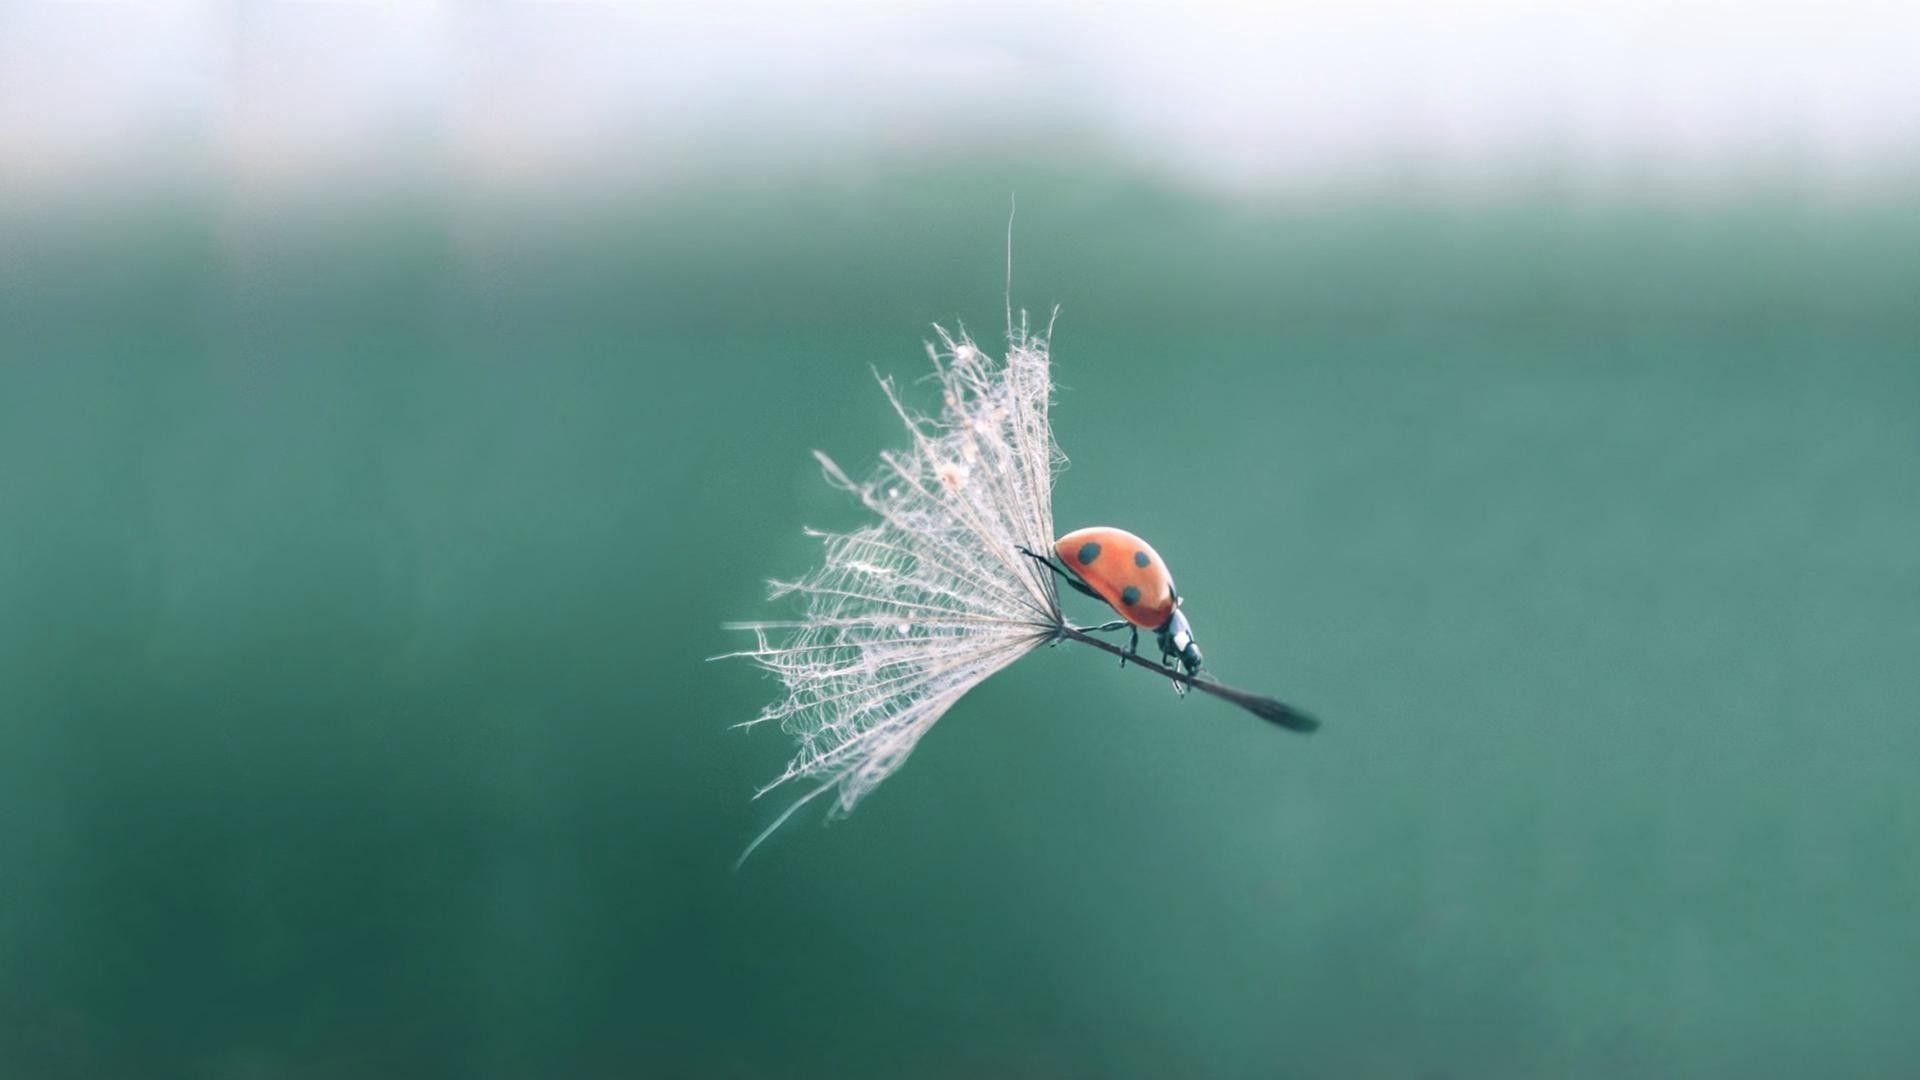 Ladybug On A Dandelion Photo